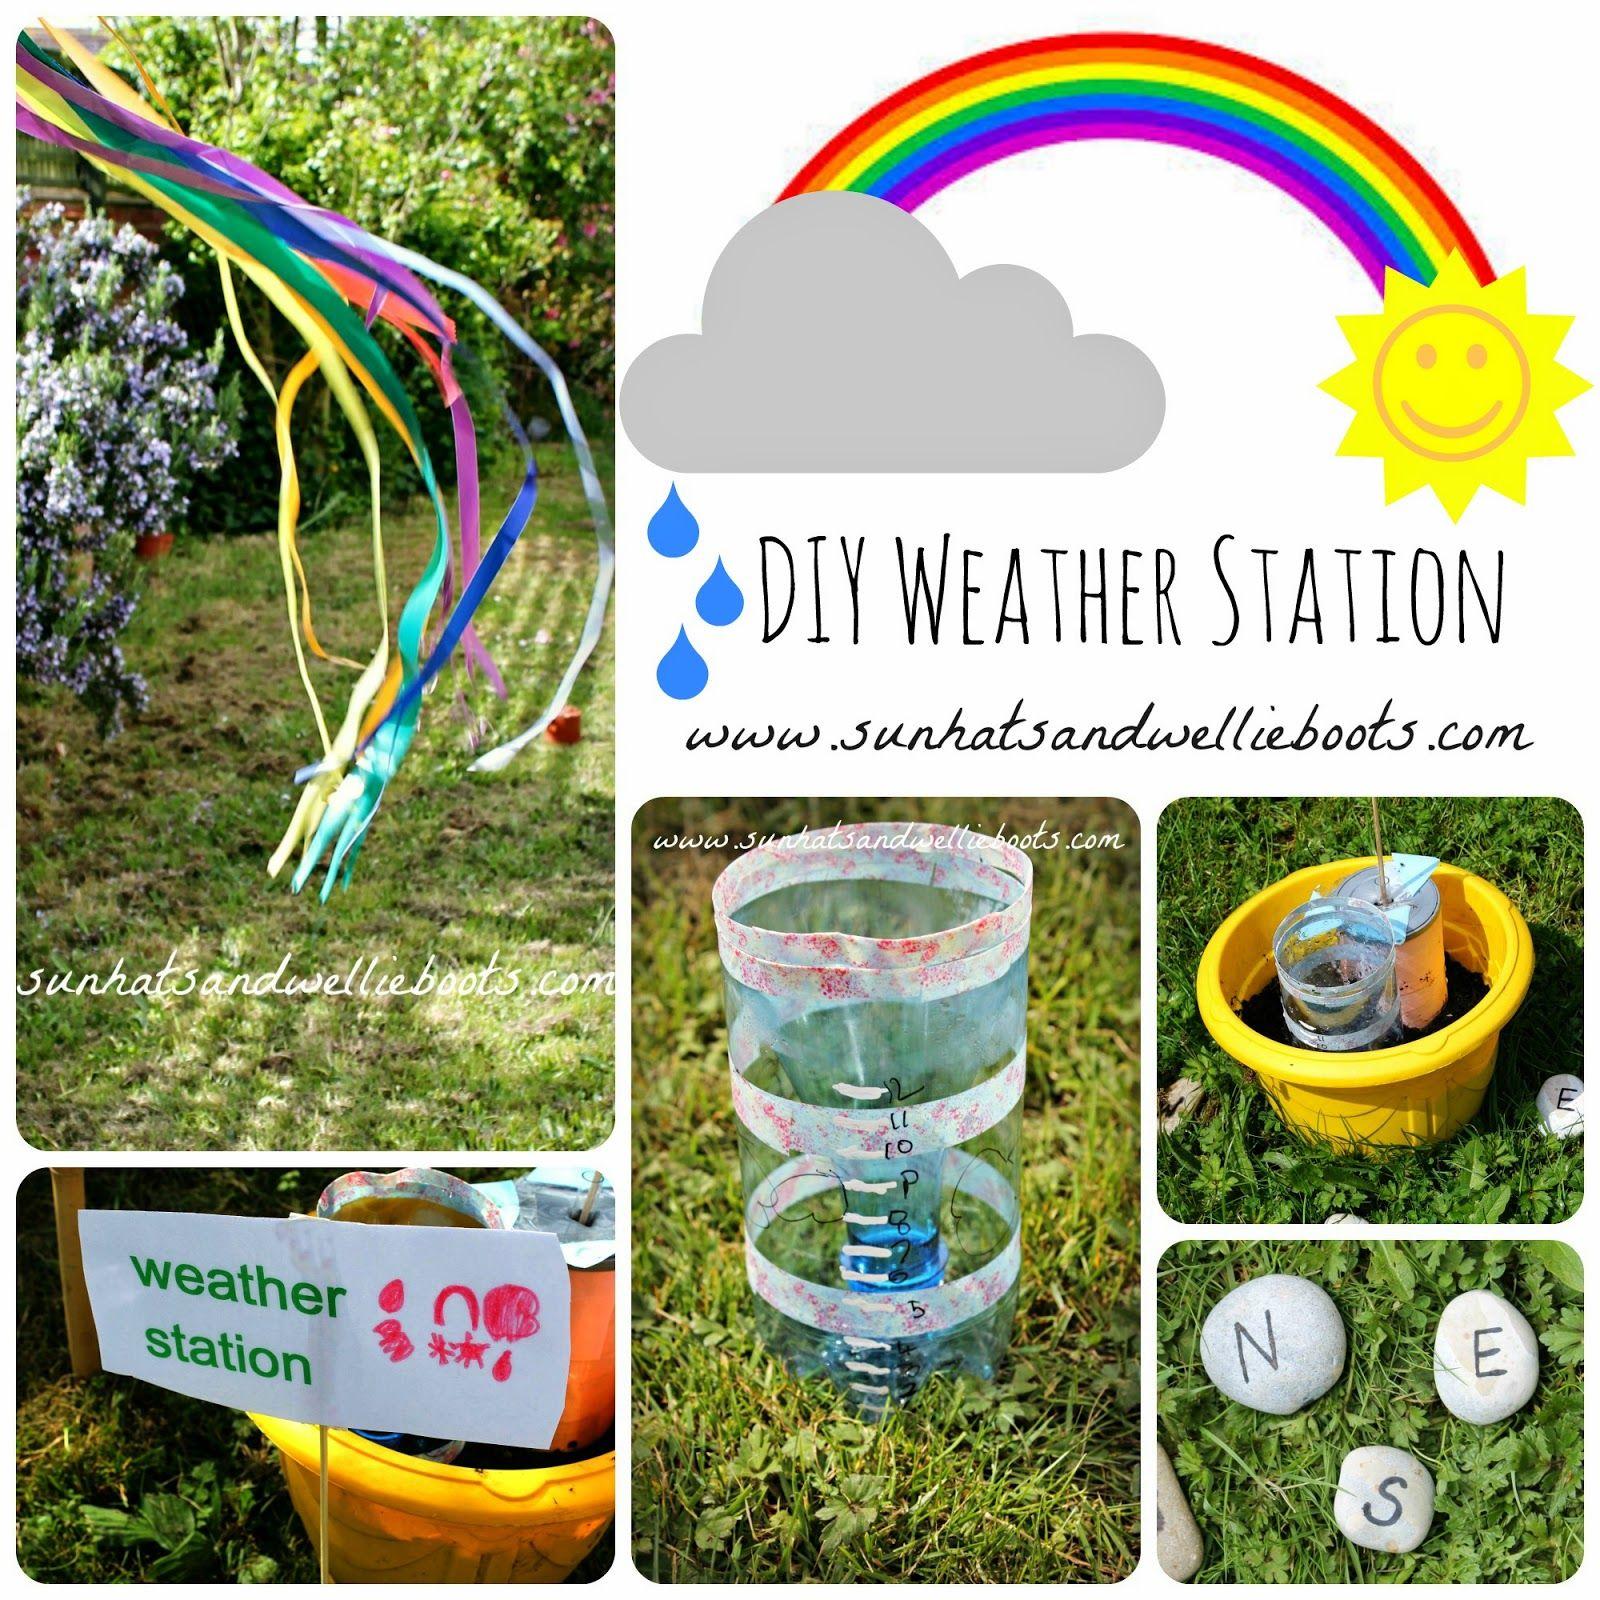 Diy Weather Station For Kids To Make